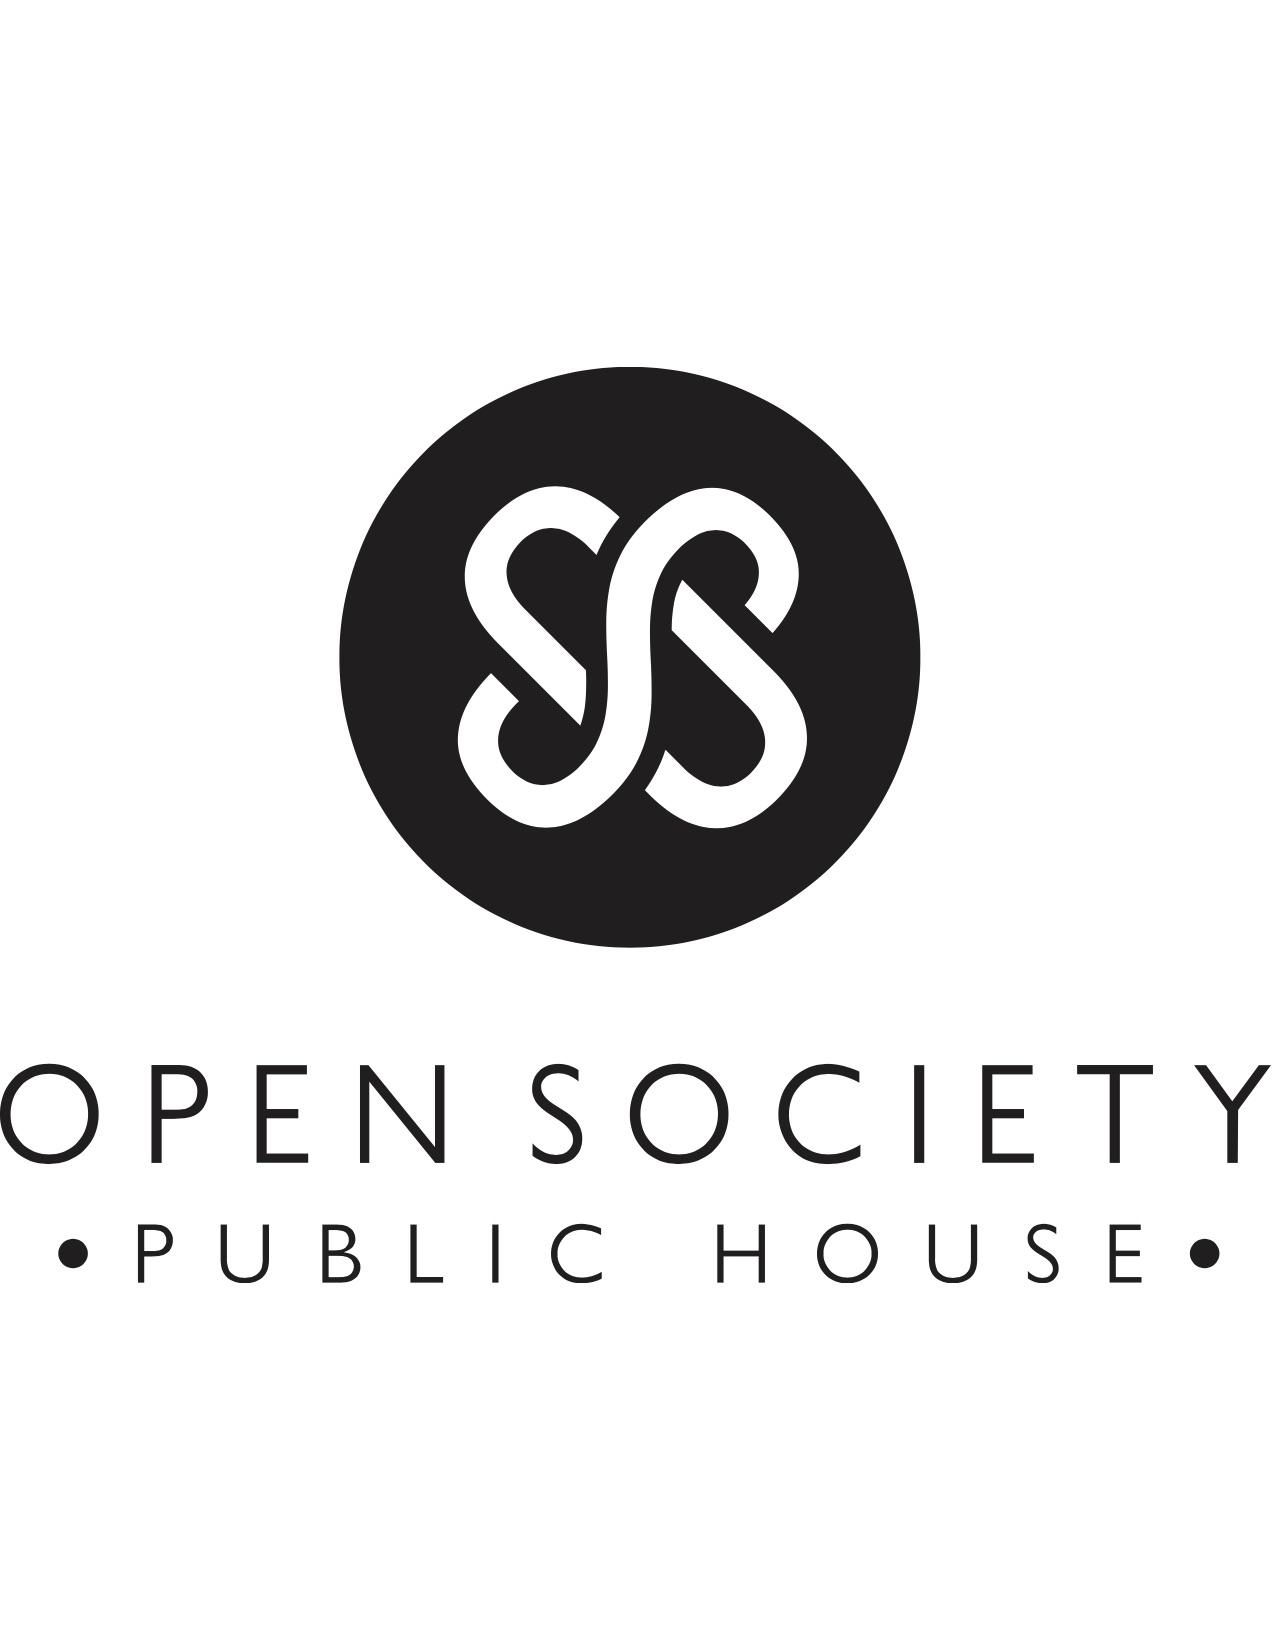 Open Society Public House